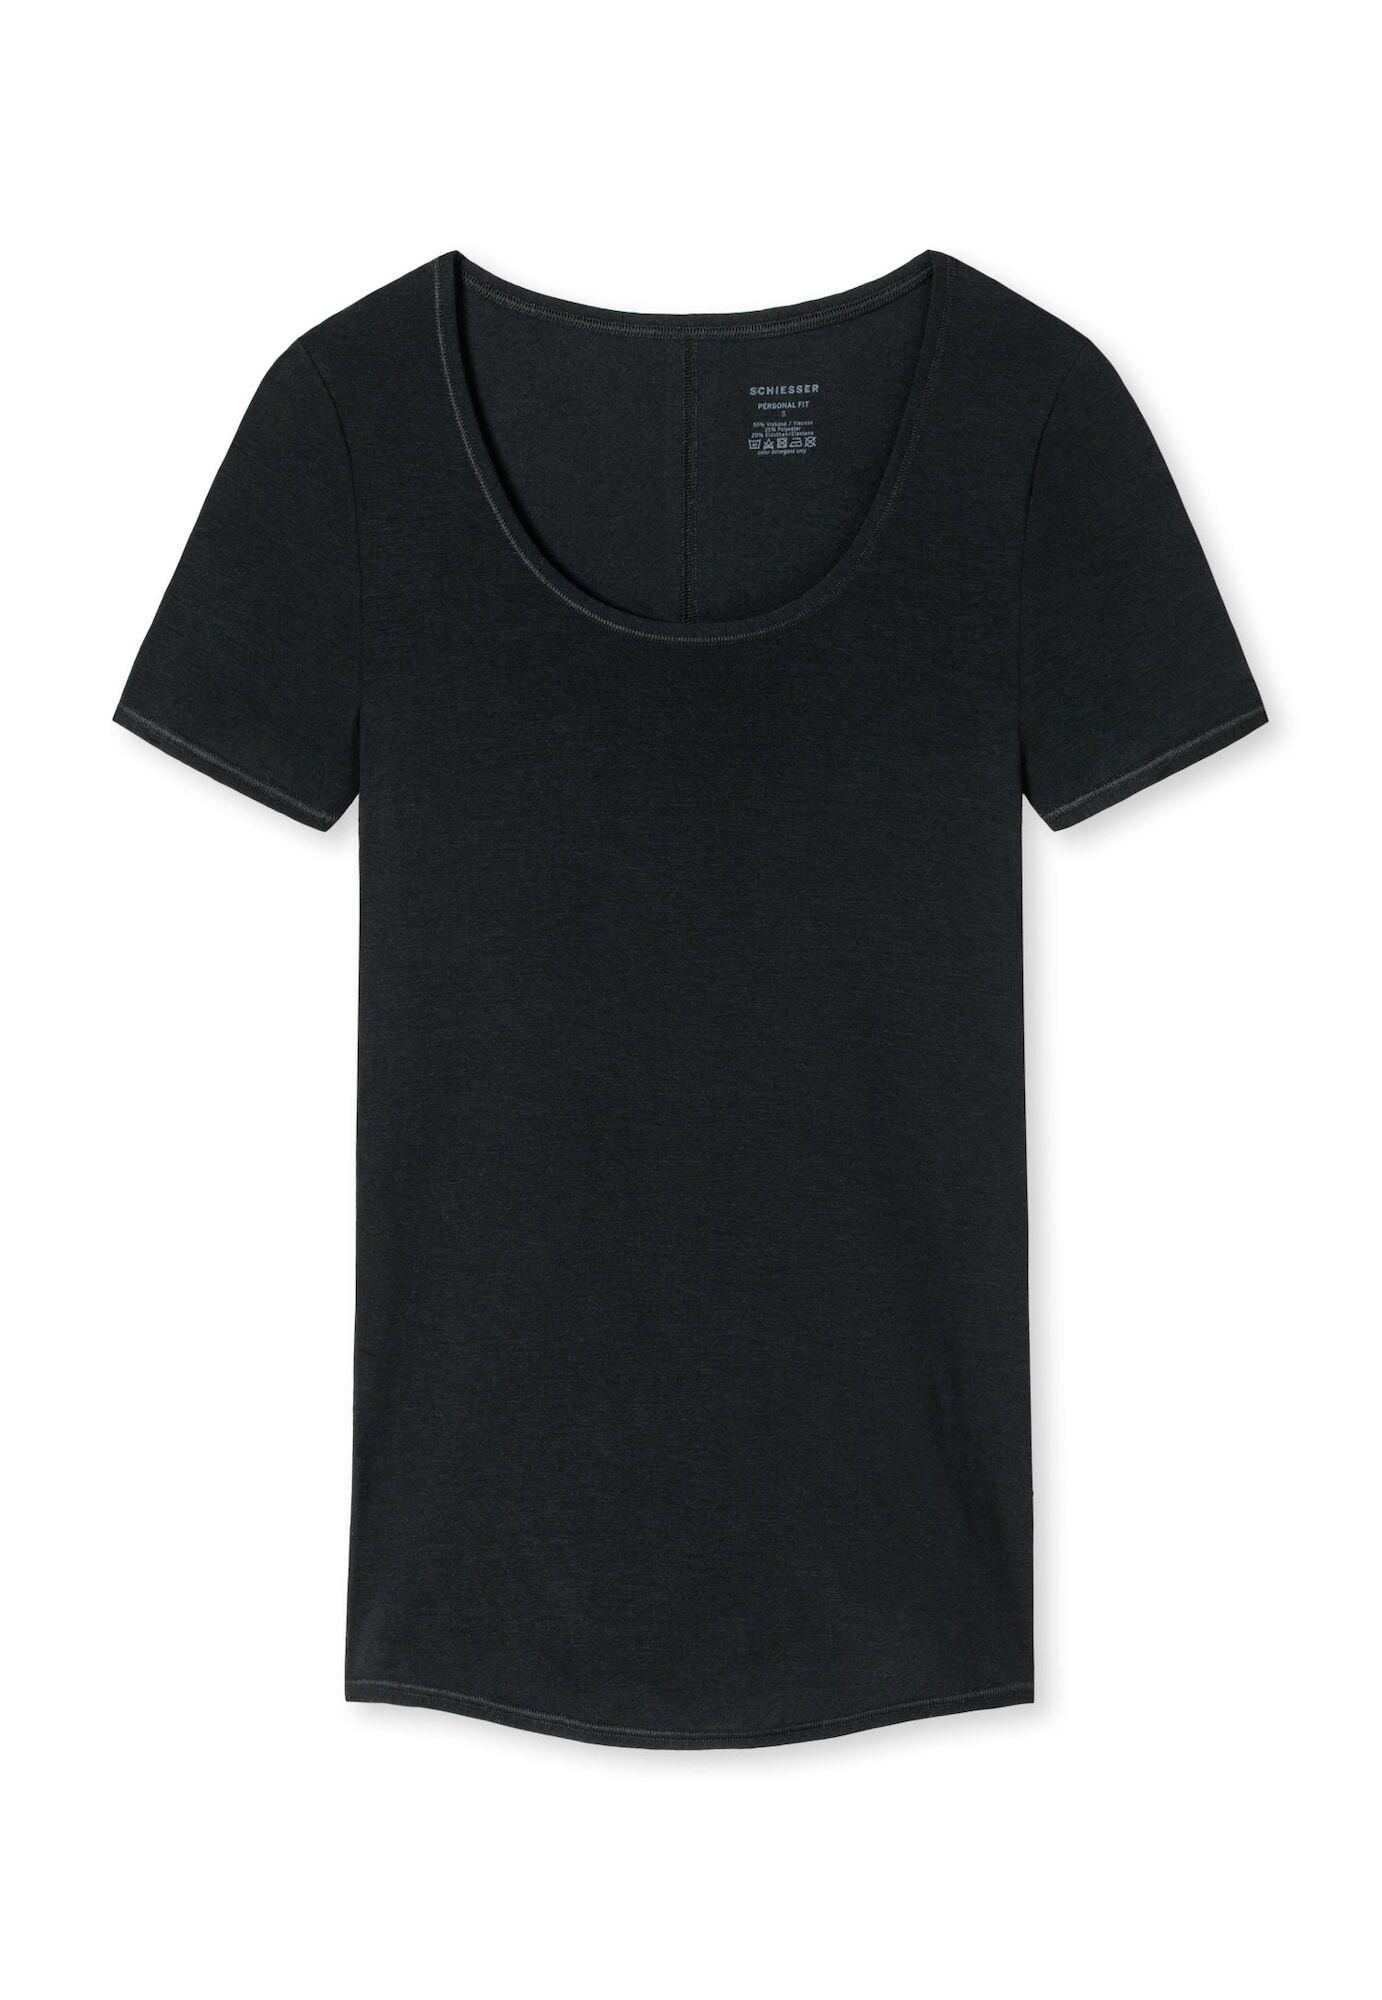 SCHIESSER Maillot de corps 'Personal Fit'  - Noir - Taille: XL - female